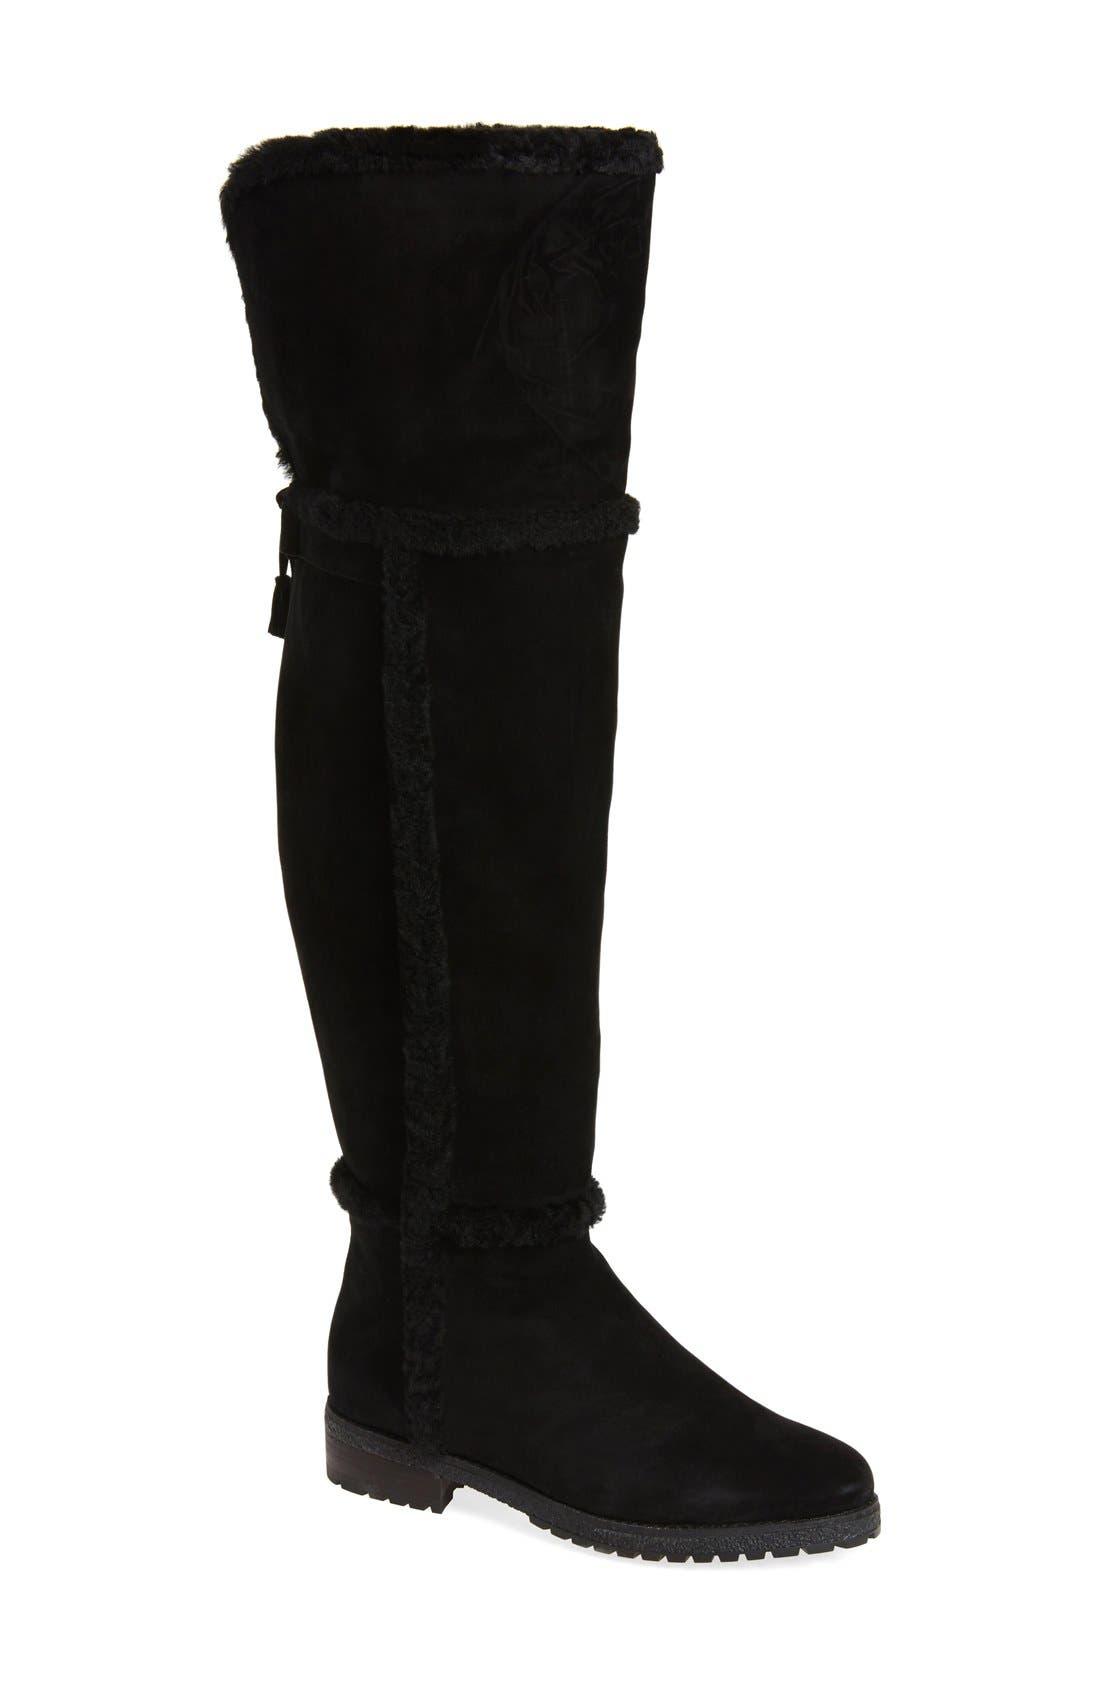 Main Image - Frye 'Tamara' Genuine Shearling Over the Knee Boot (Women)